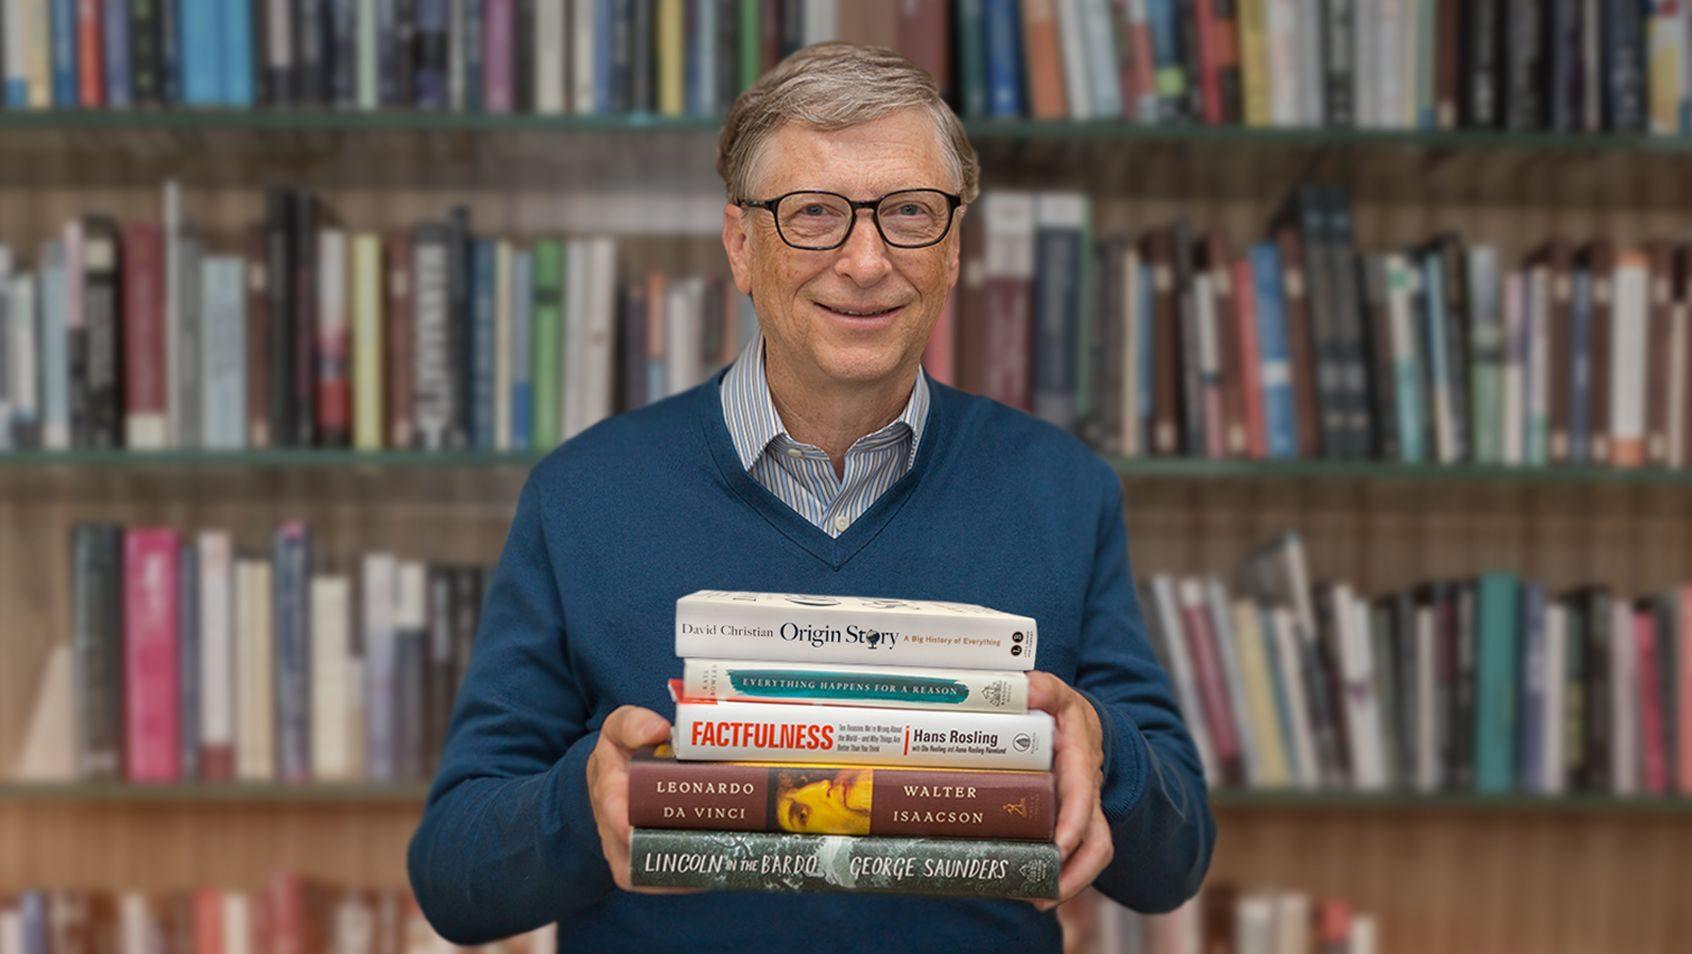 Bill Gates book list 2018: